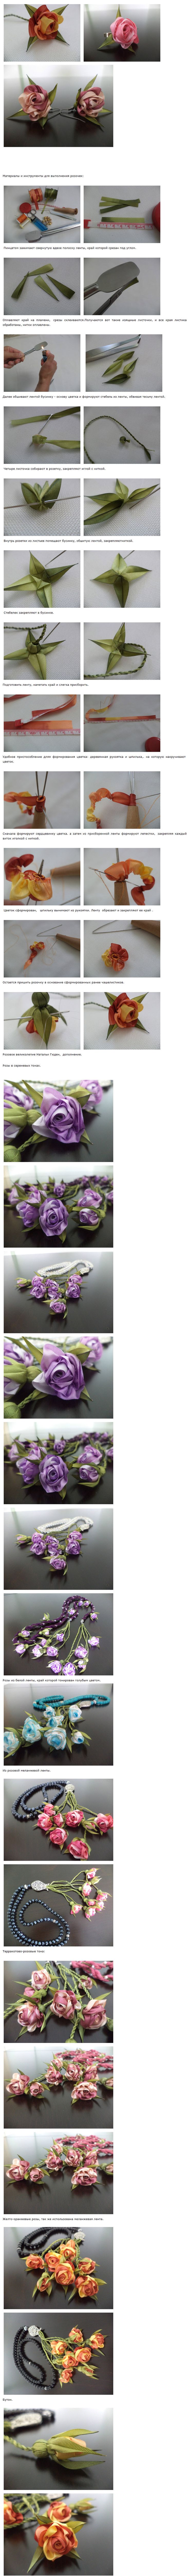 tsvetok-iz-tkani-svoimi-rukami4.jpg (863×11796)